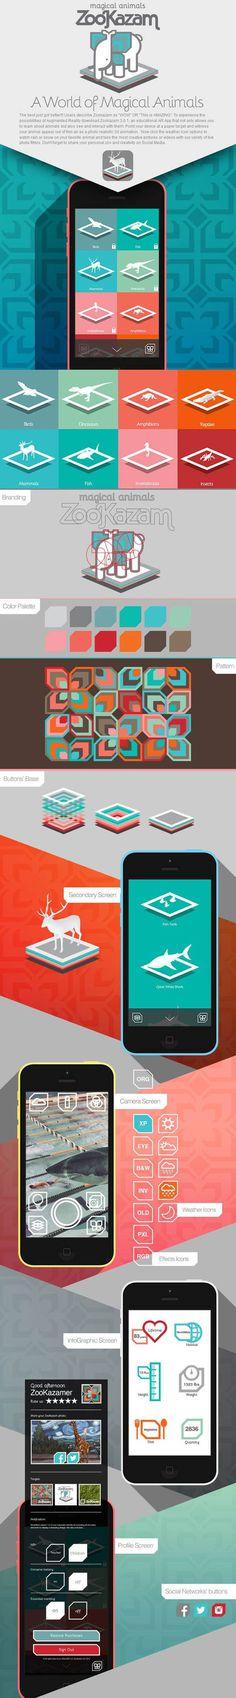 ZooKazam 3.0 AppDesign by Reza Alavi